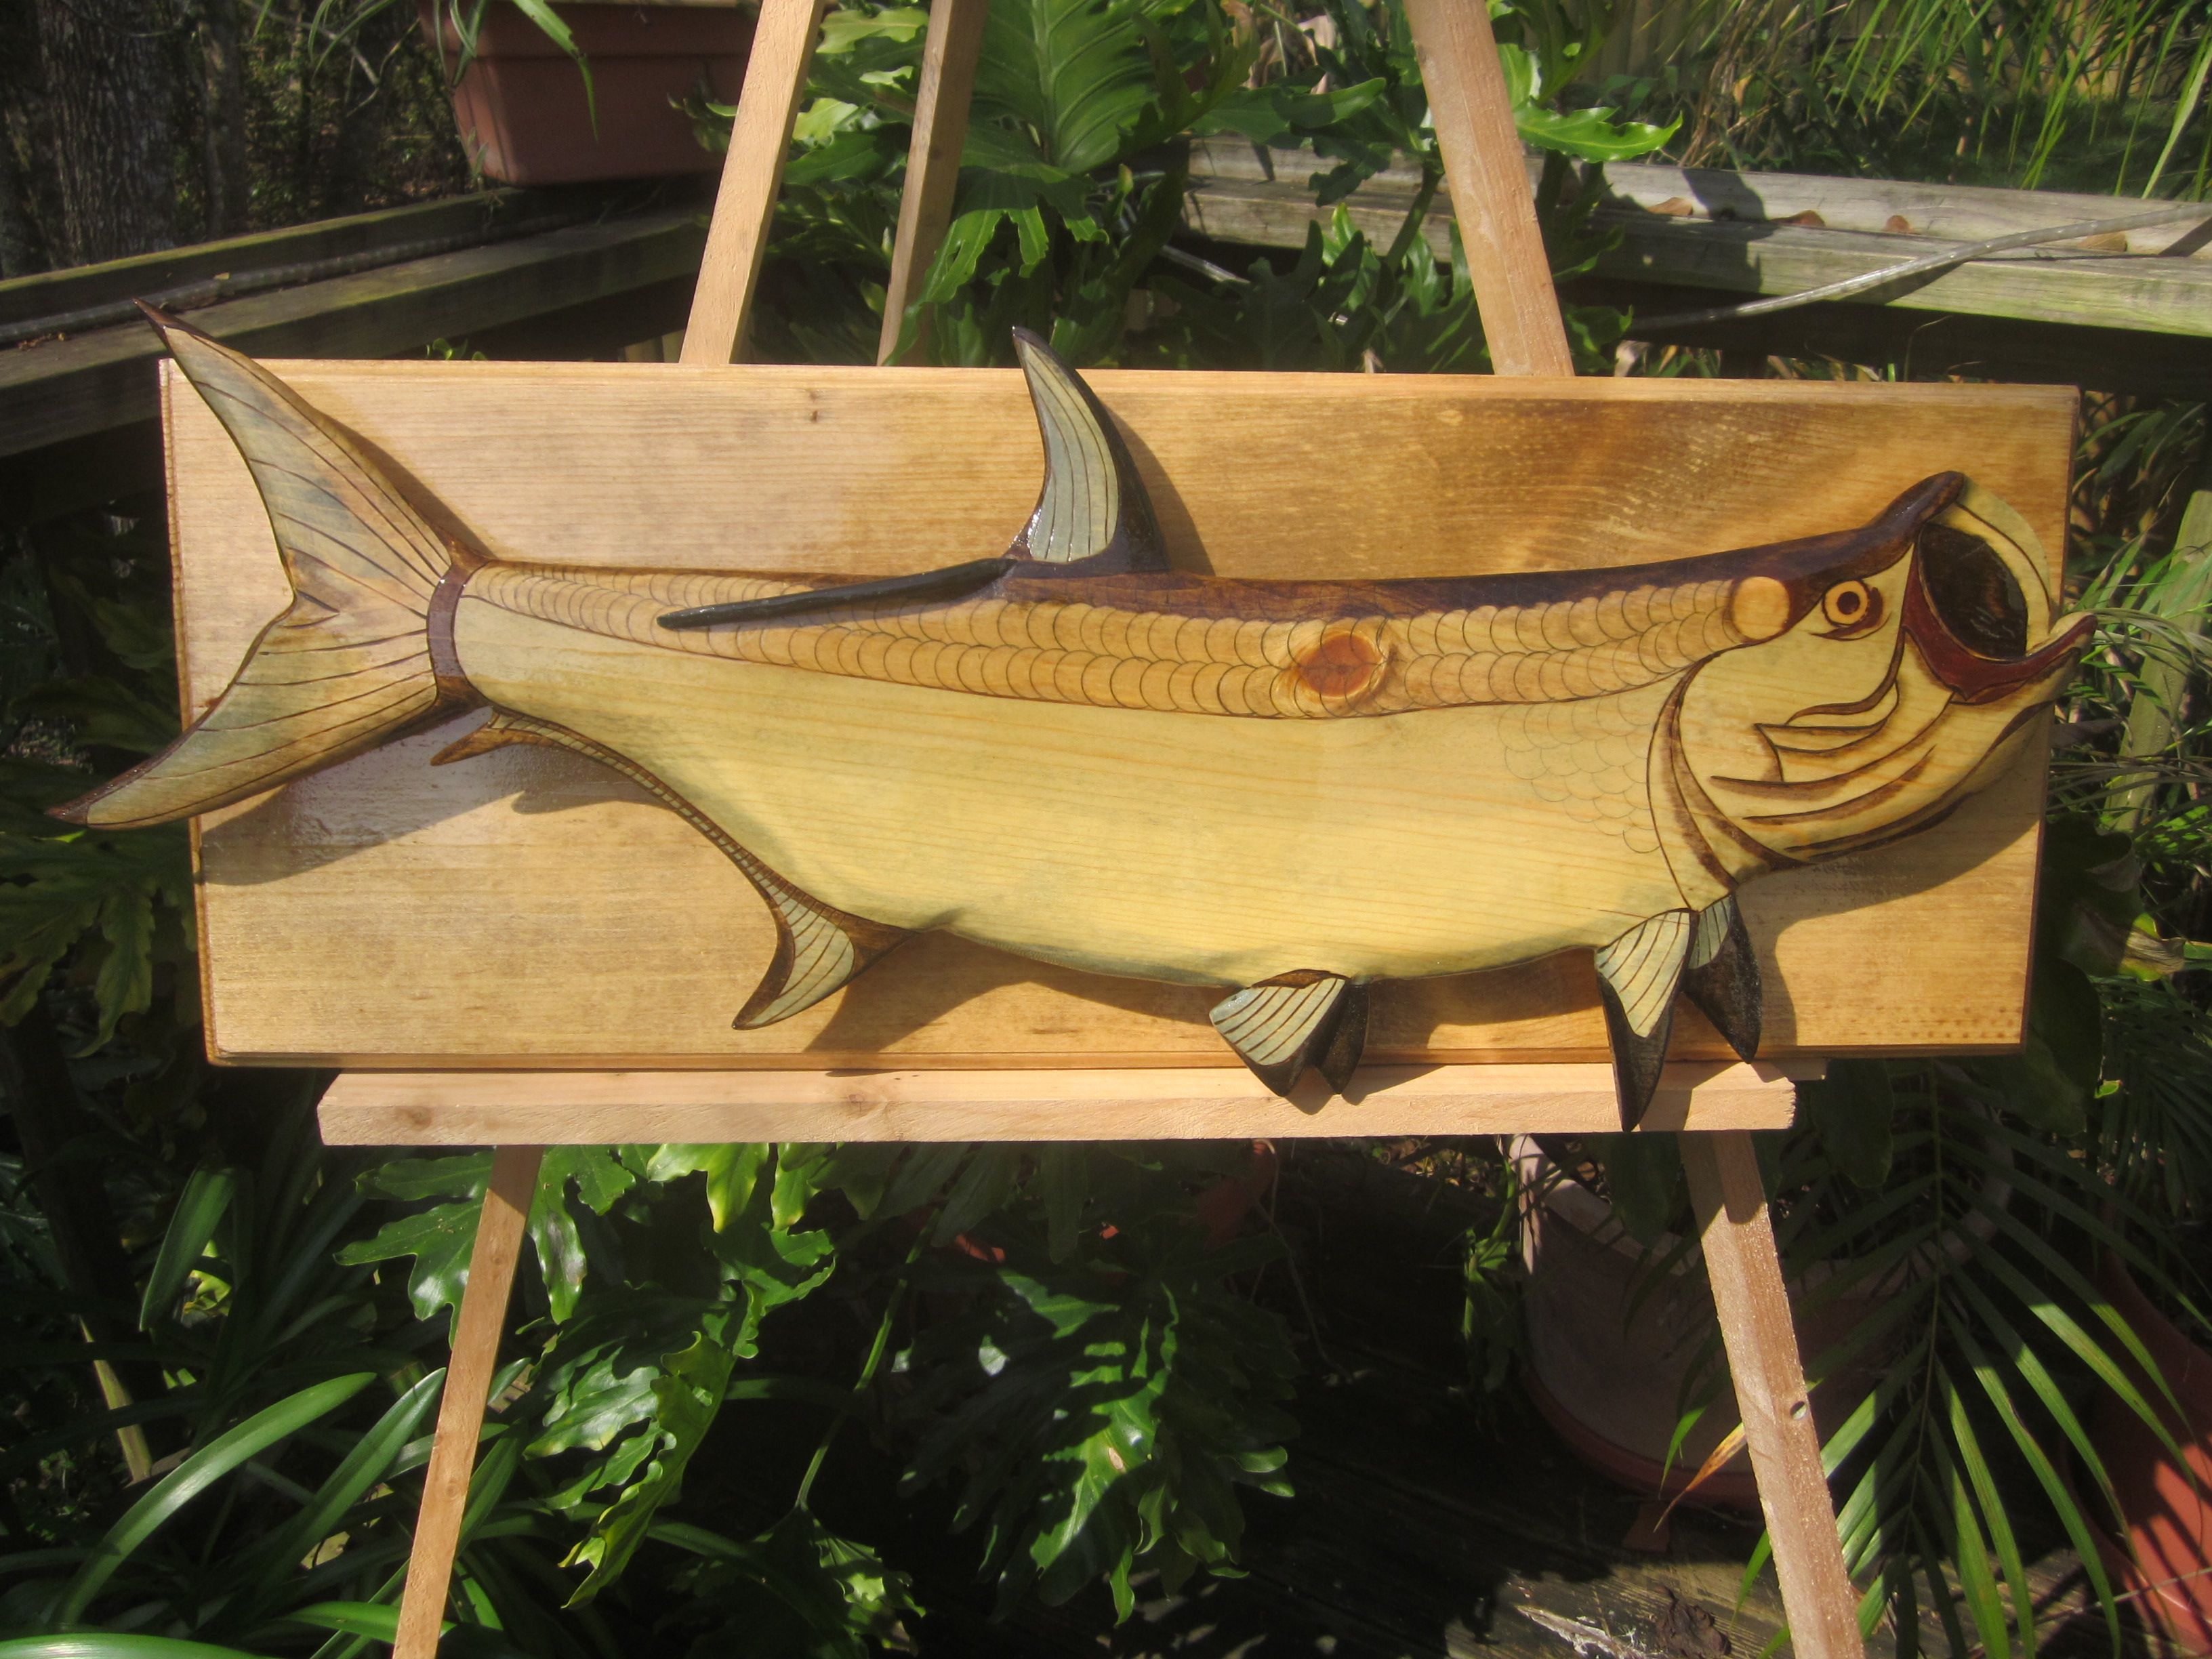 Florida Tarpon | Fishing art | Pinterest | Fish and Galleries